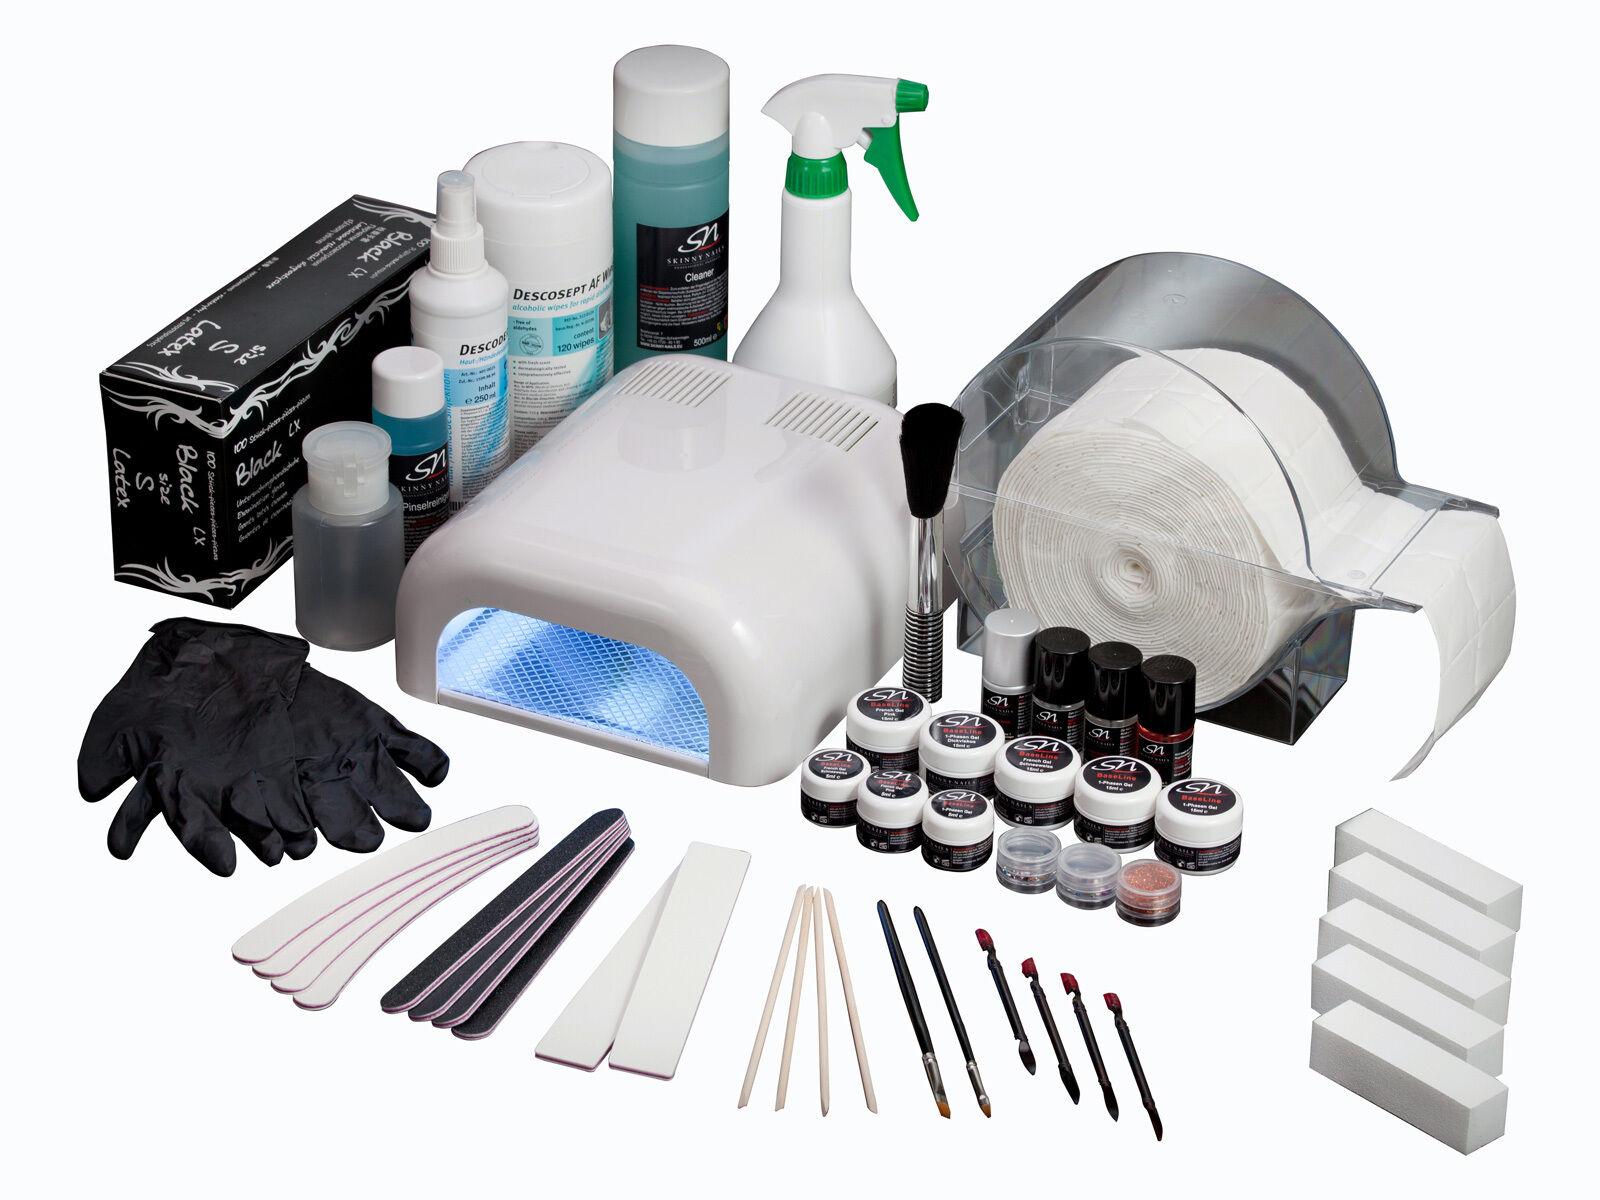 Naturnagelverstärkung Nagelstudio Starterset Nagelset UV Gel Nageldesign Set A3